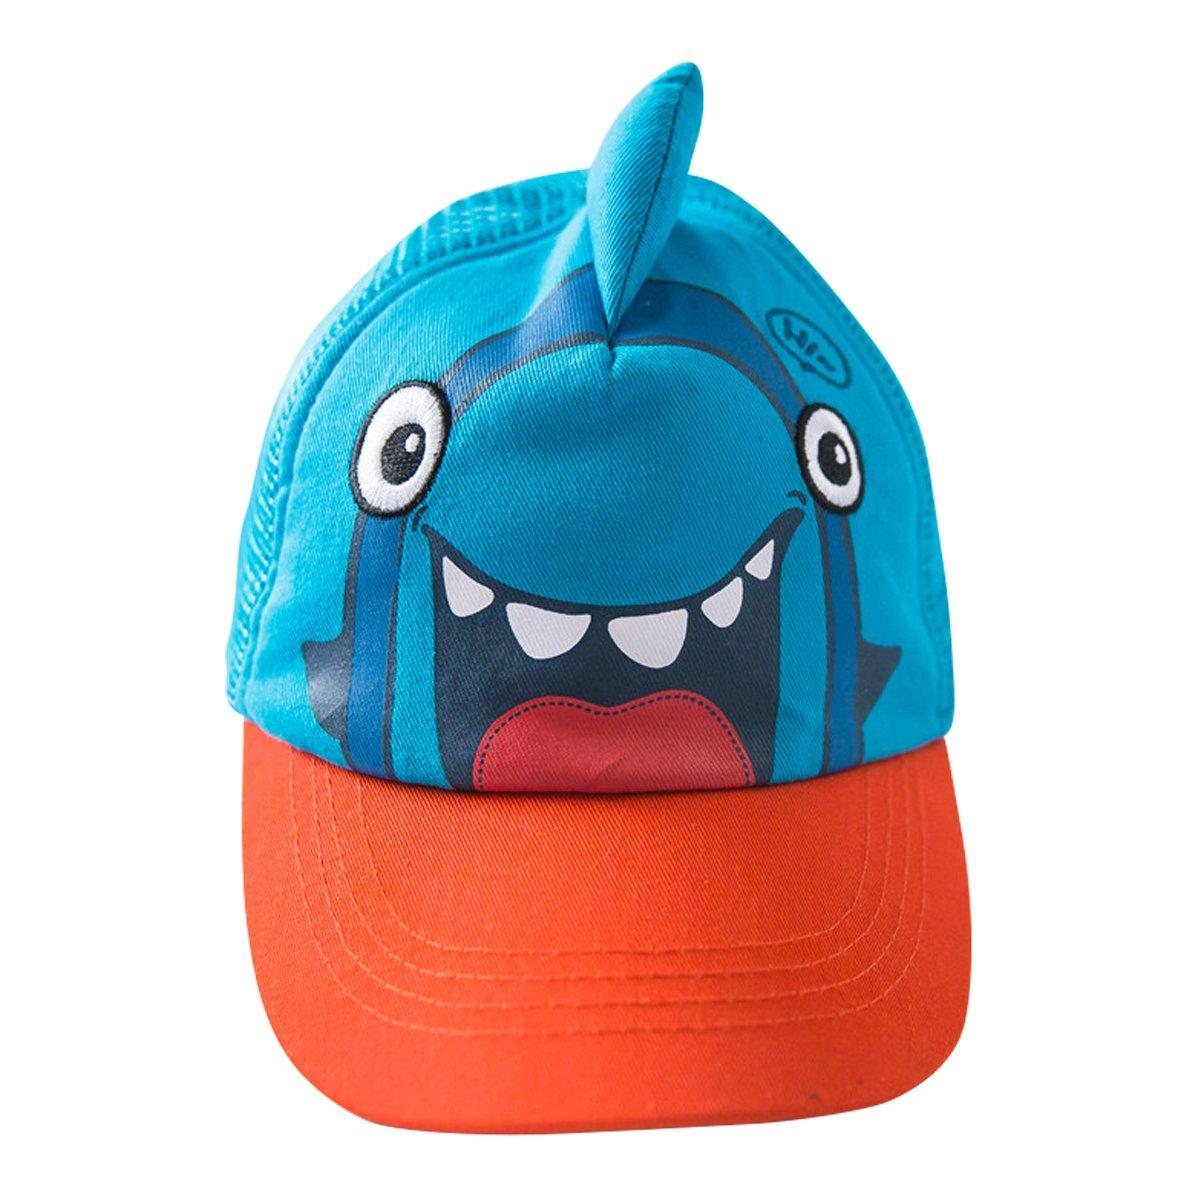 E.mirreh Baby Boys Shark Cartoon Baseball Cap Summer Hat L